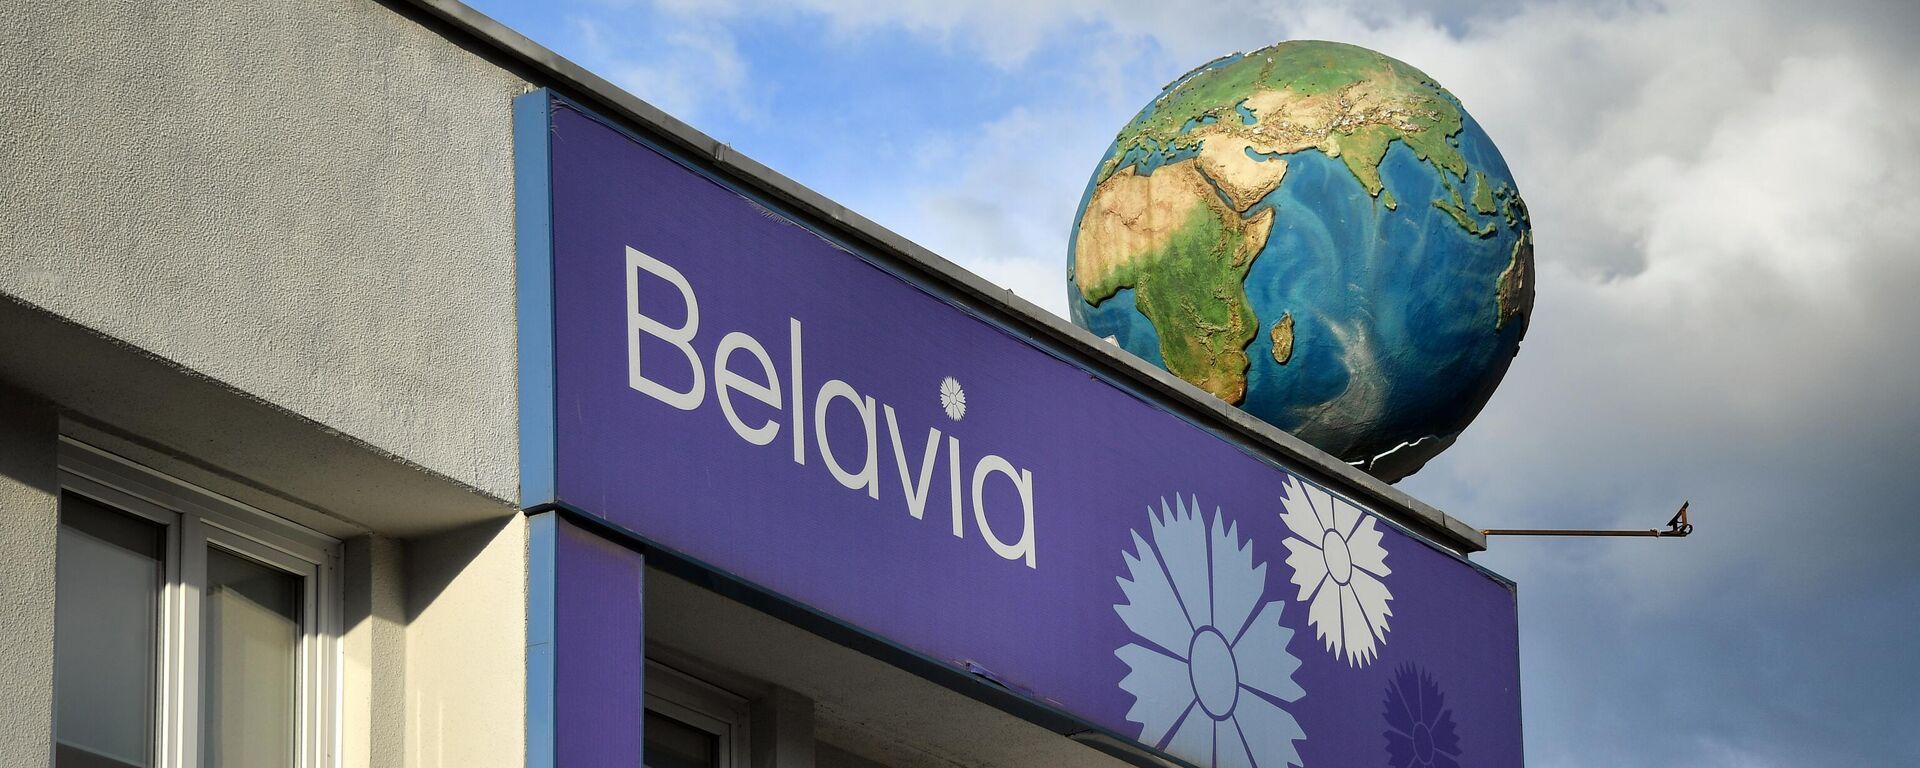 Logo de la aerolínea bielorrusa Belavia - Sputnik Mundo, 1920, 28.05.2021